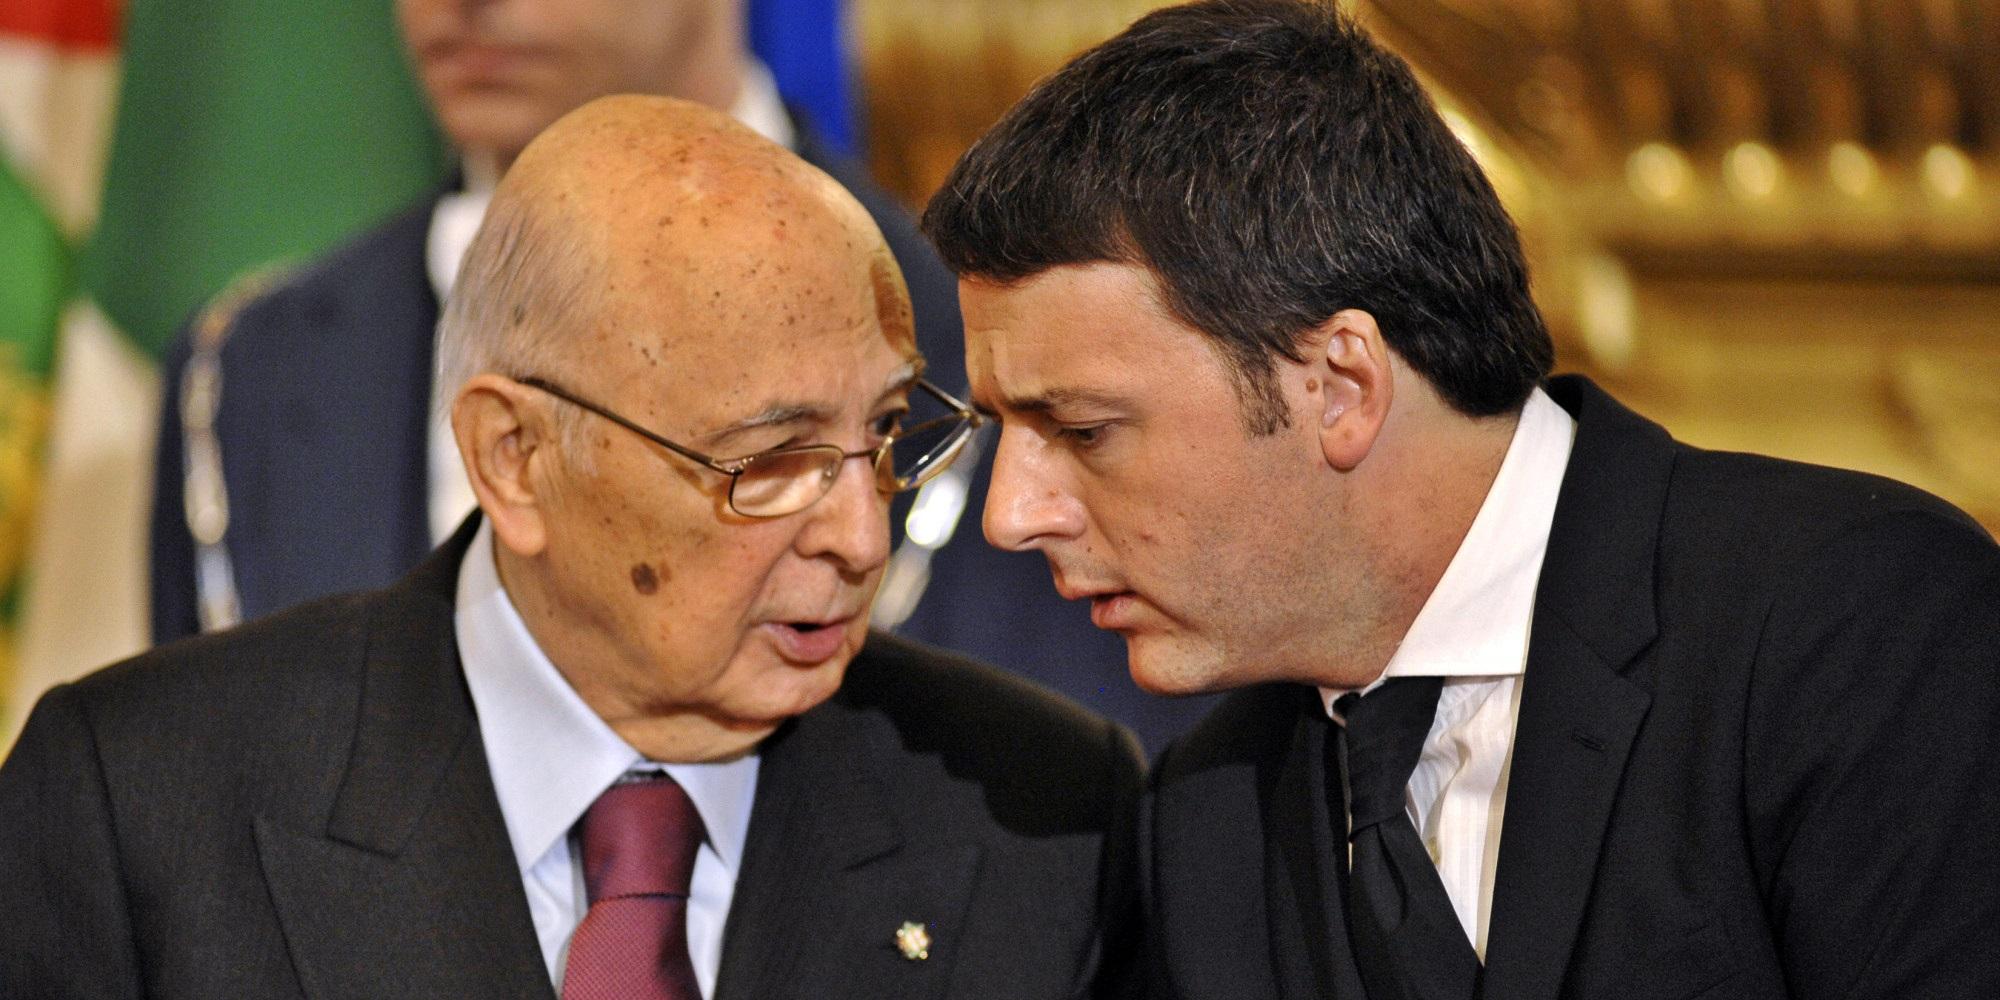 Renzi-Napolitano, la coppia scoppia